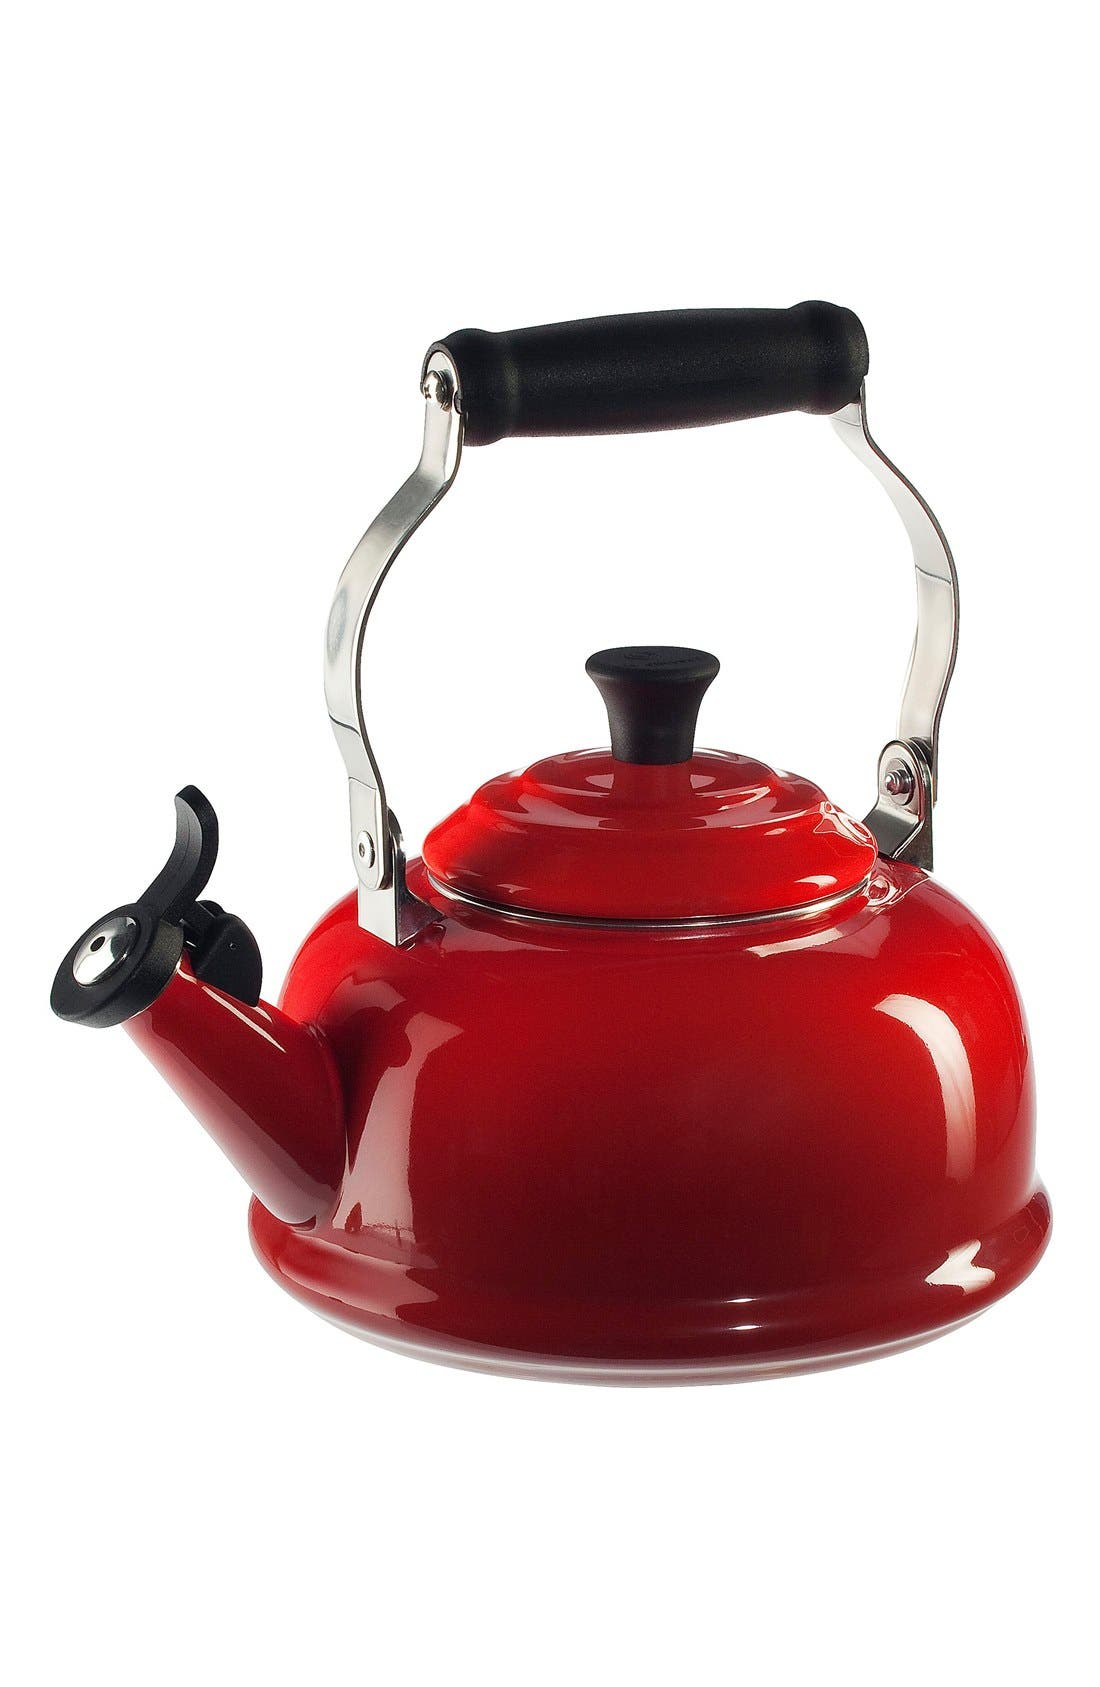 Main Image - Le Creuset Classic Whistling Tea Kettle